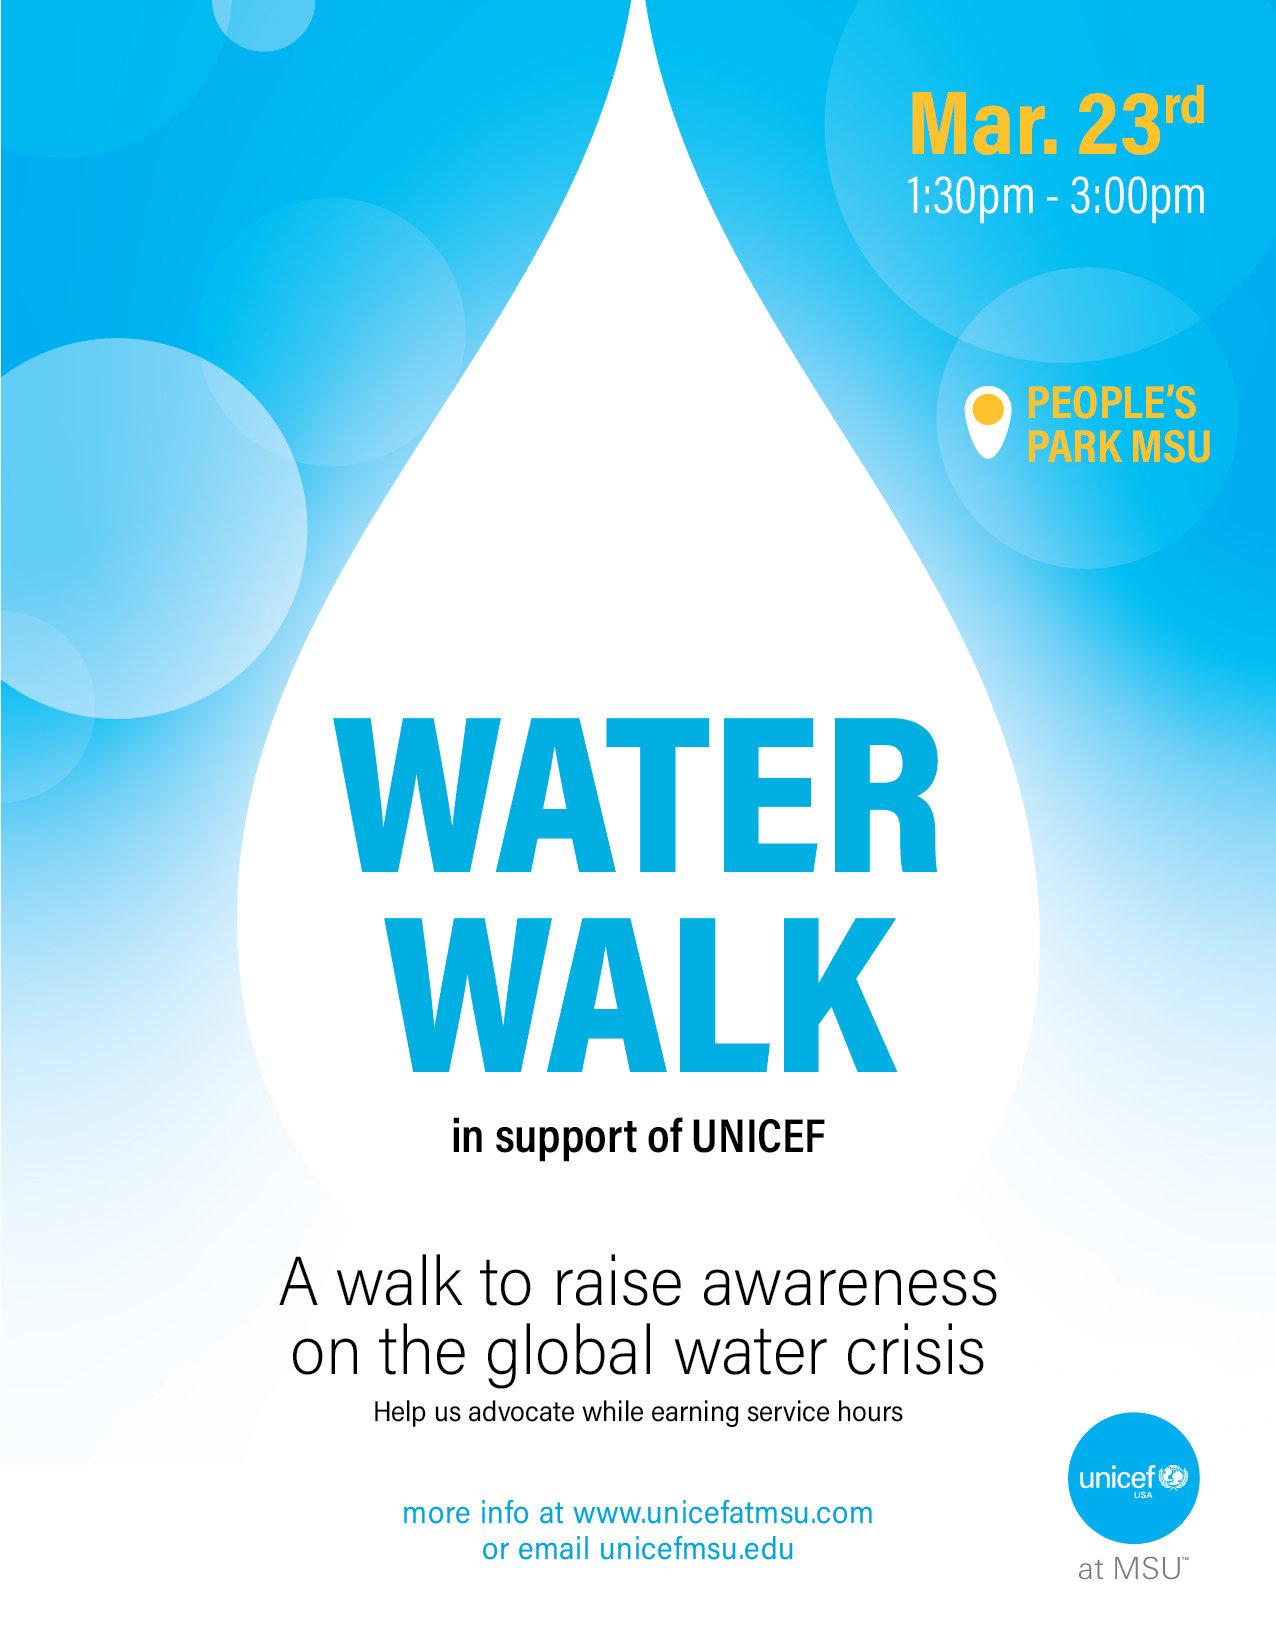 UNICEF Water Walk